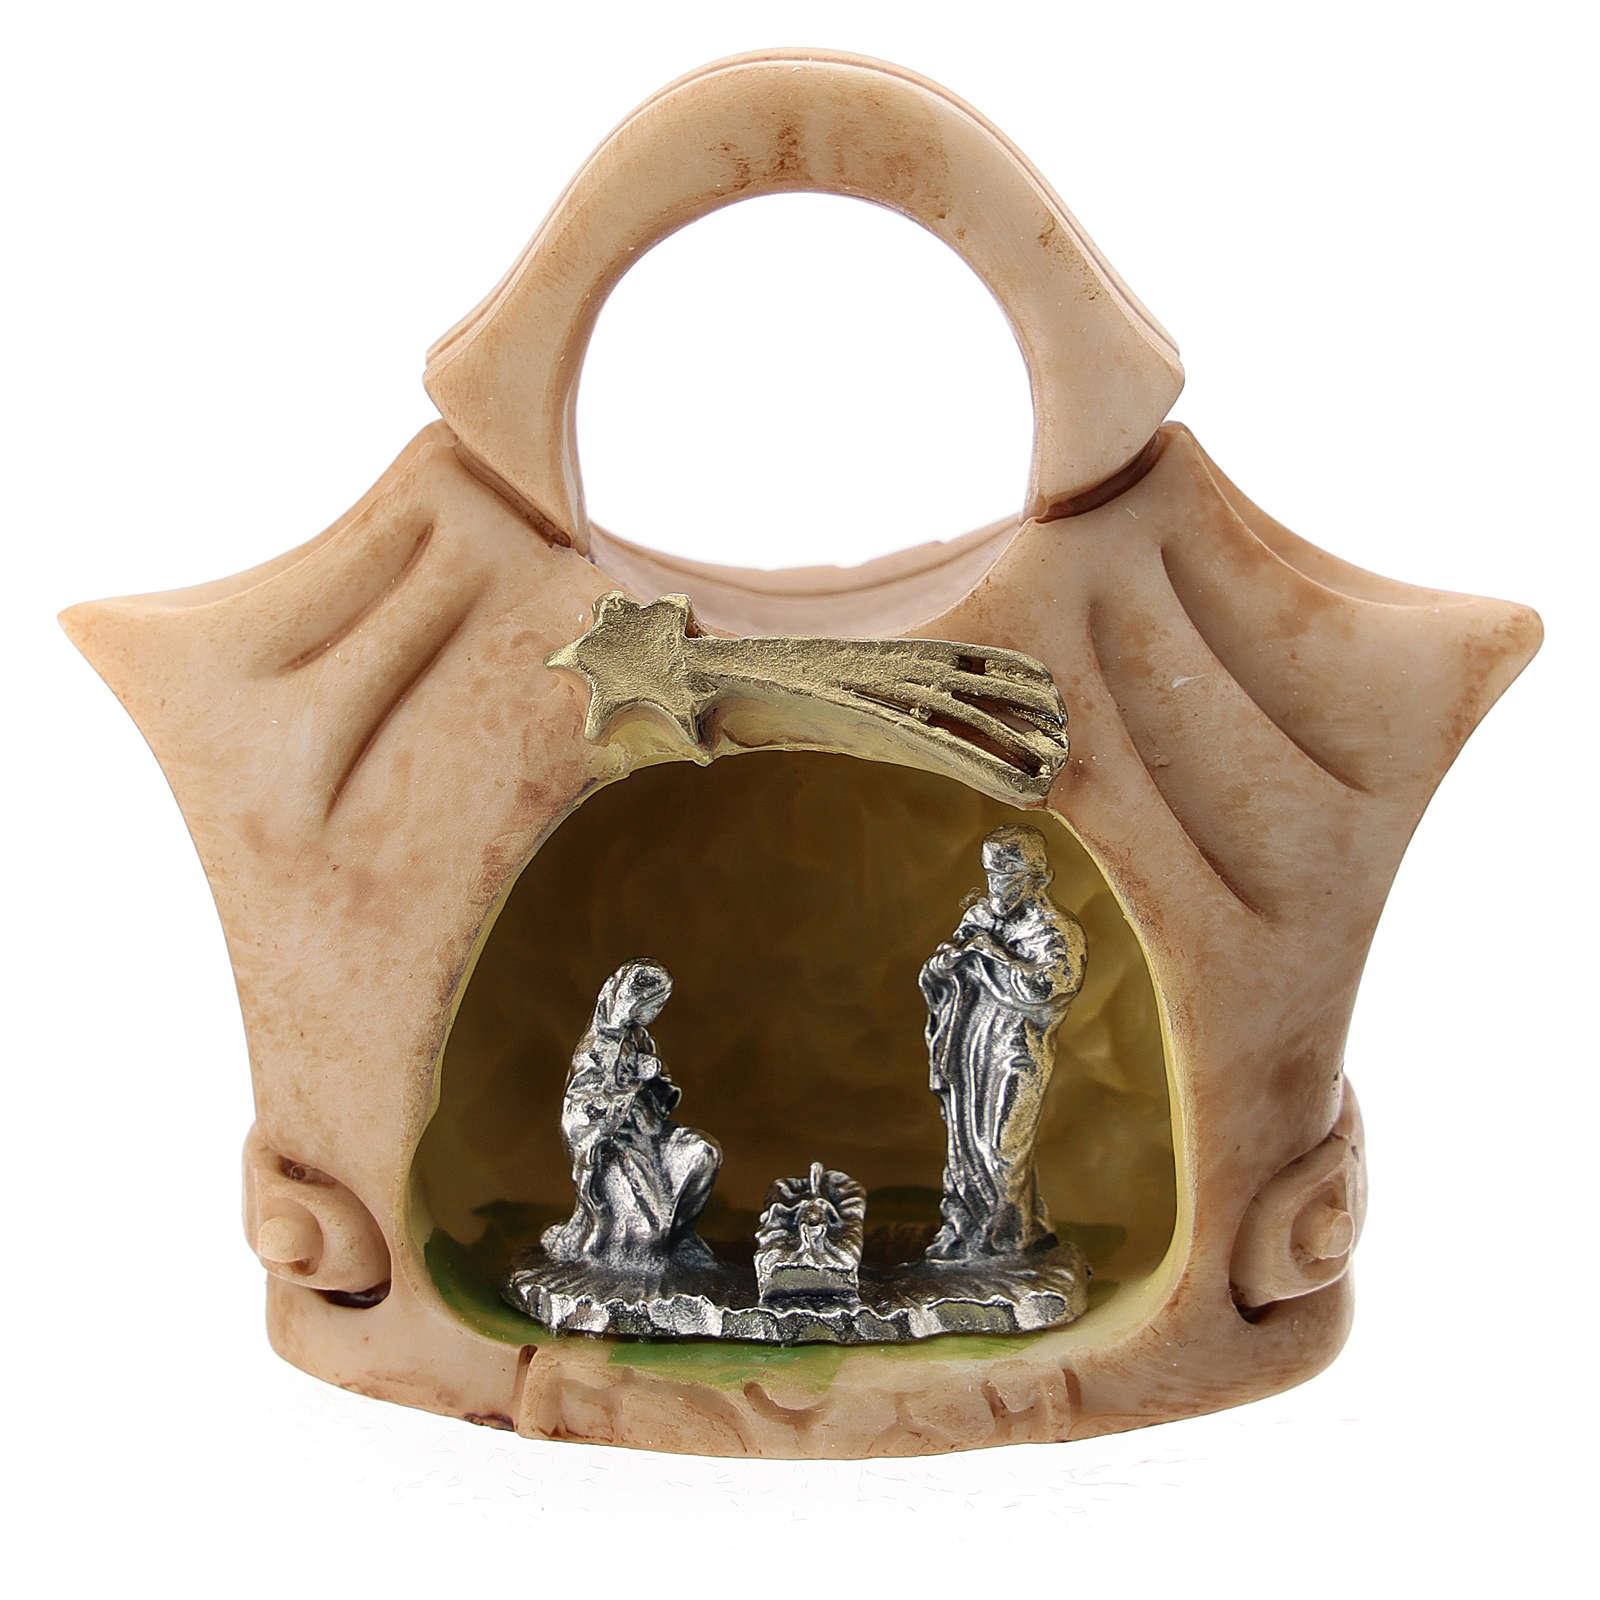 Borsetta resina con Sacra Famiglia metallo 5 cm 3